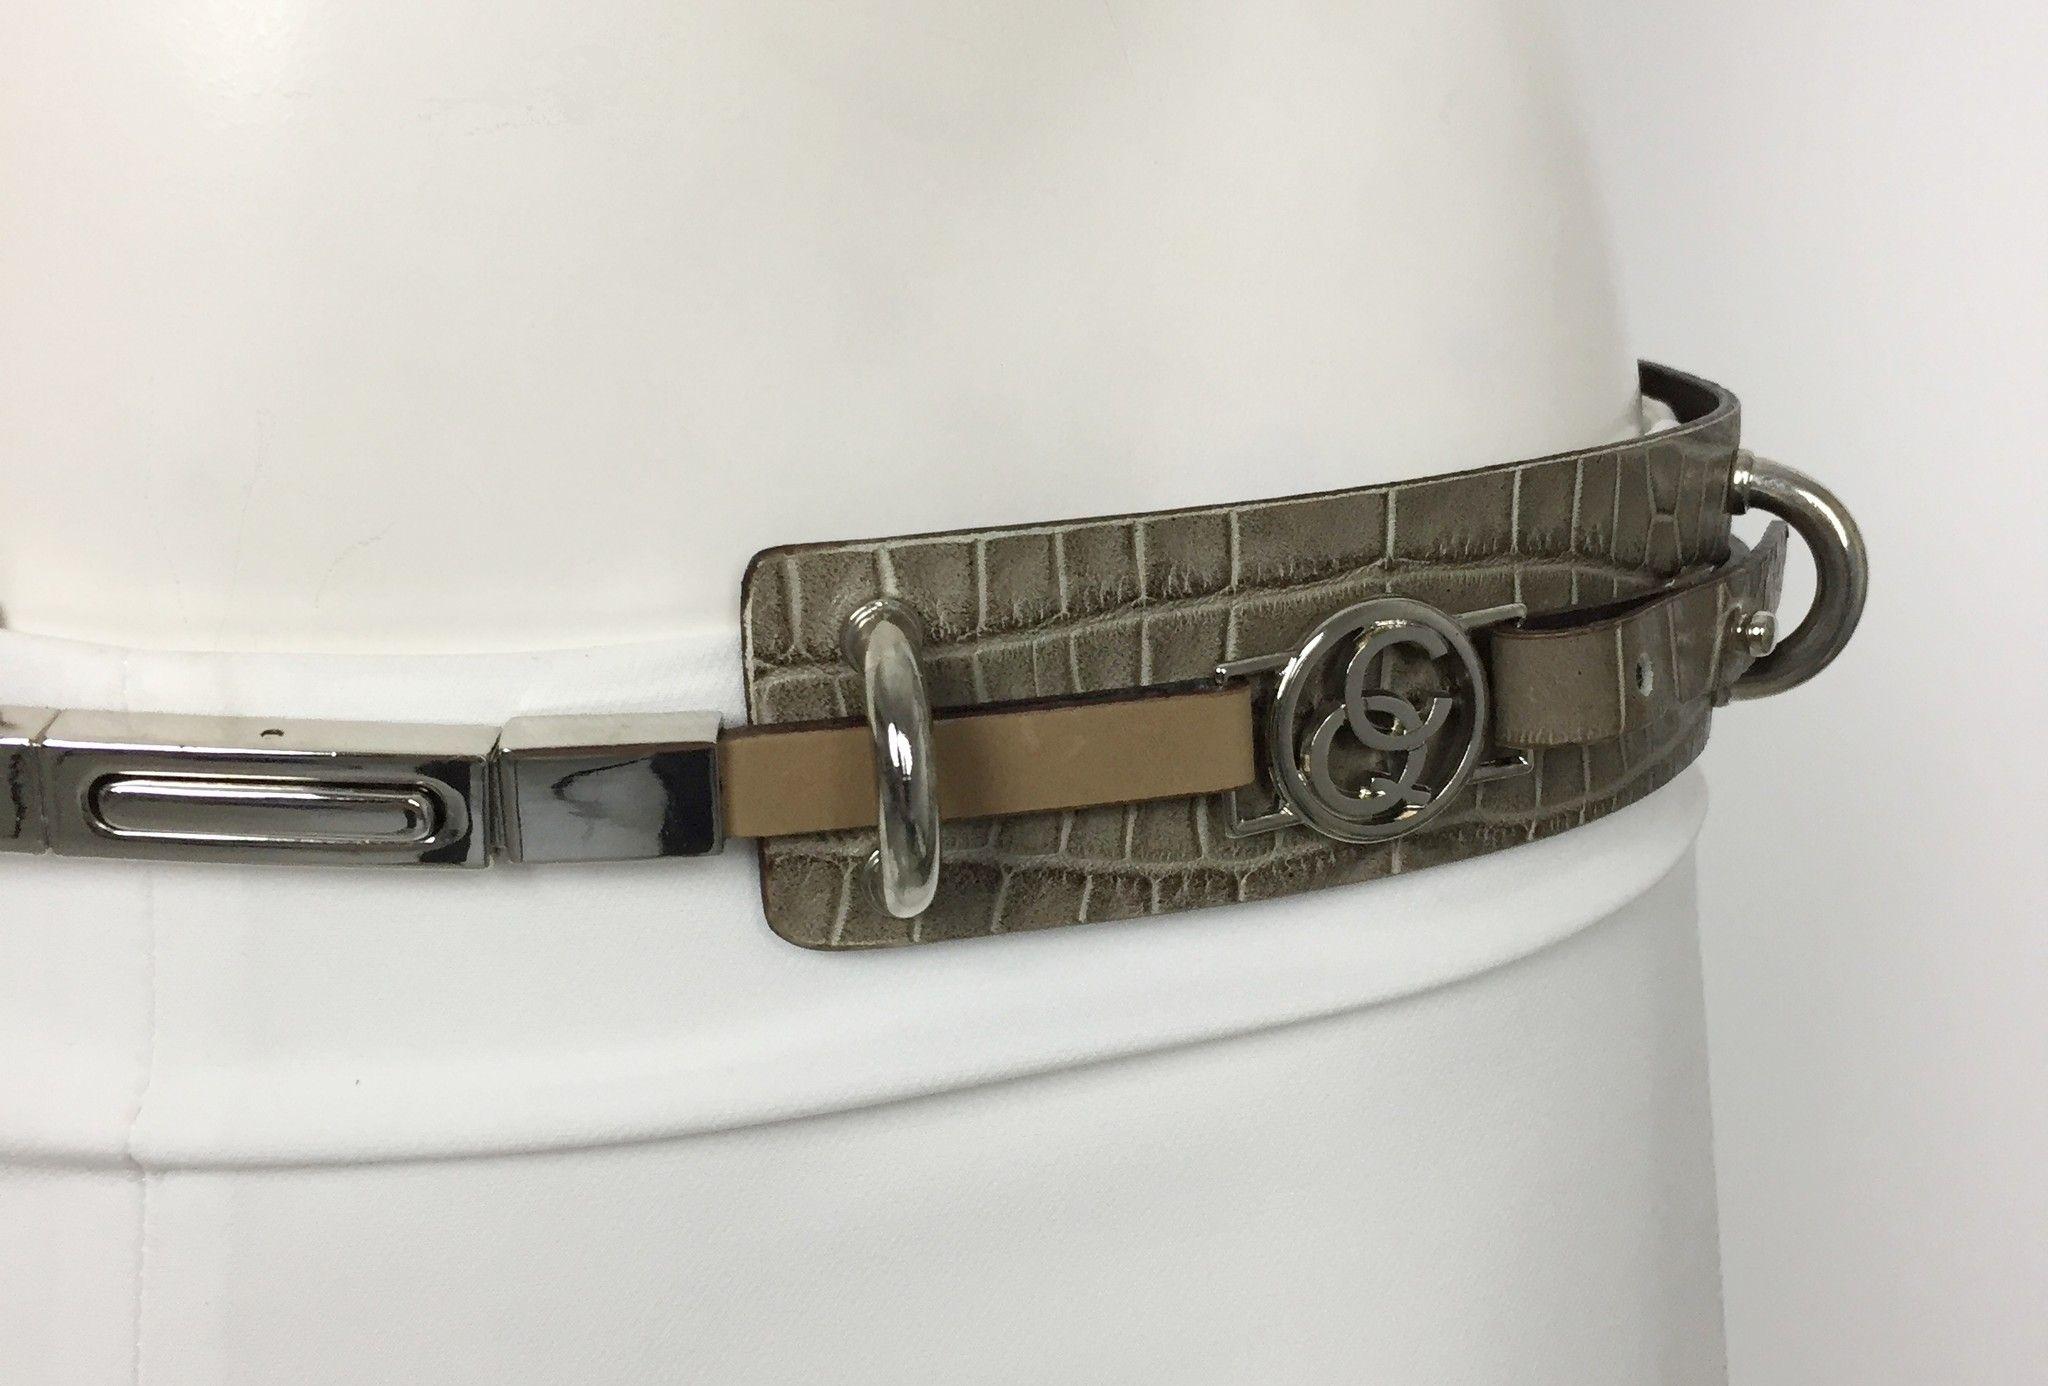 Cintura Carolina 40 in Stampa Cocco Vera Pelle Cod.9846544